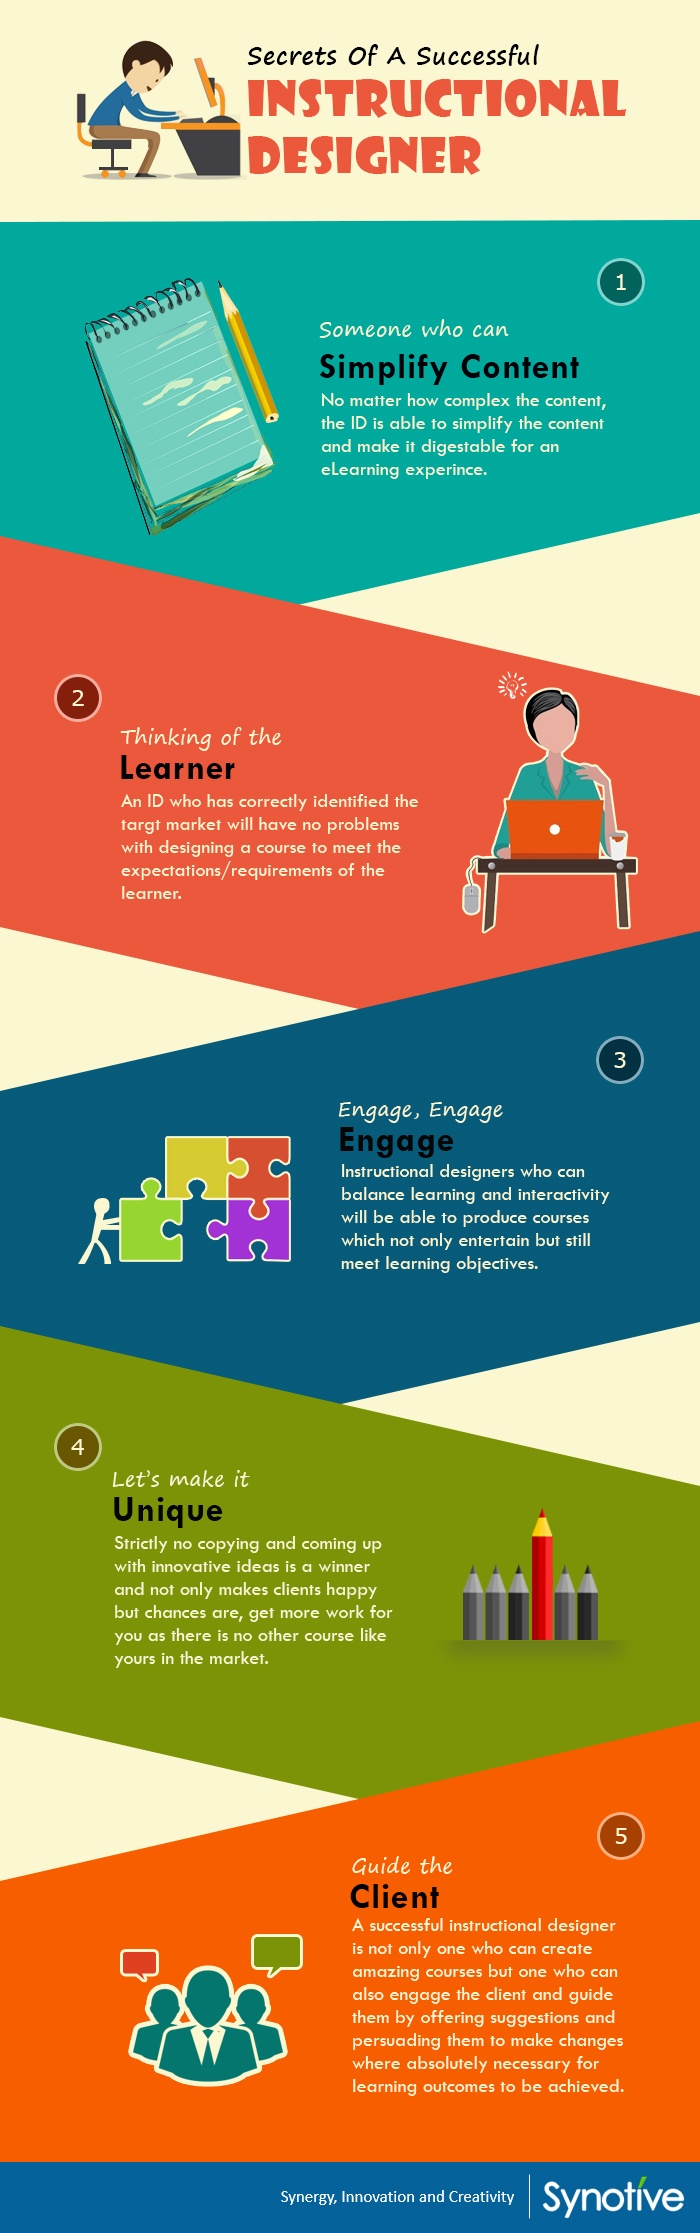 Secrets of a Successful Instructional Designer Infographic